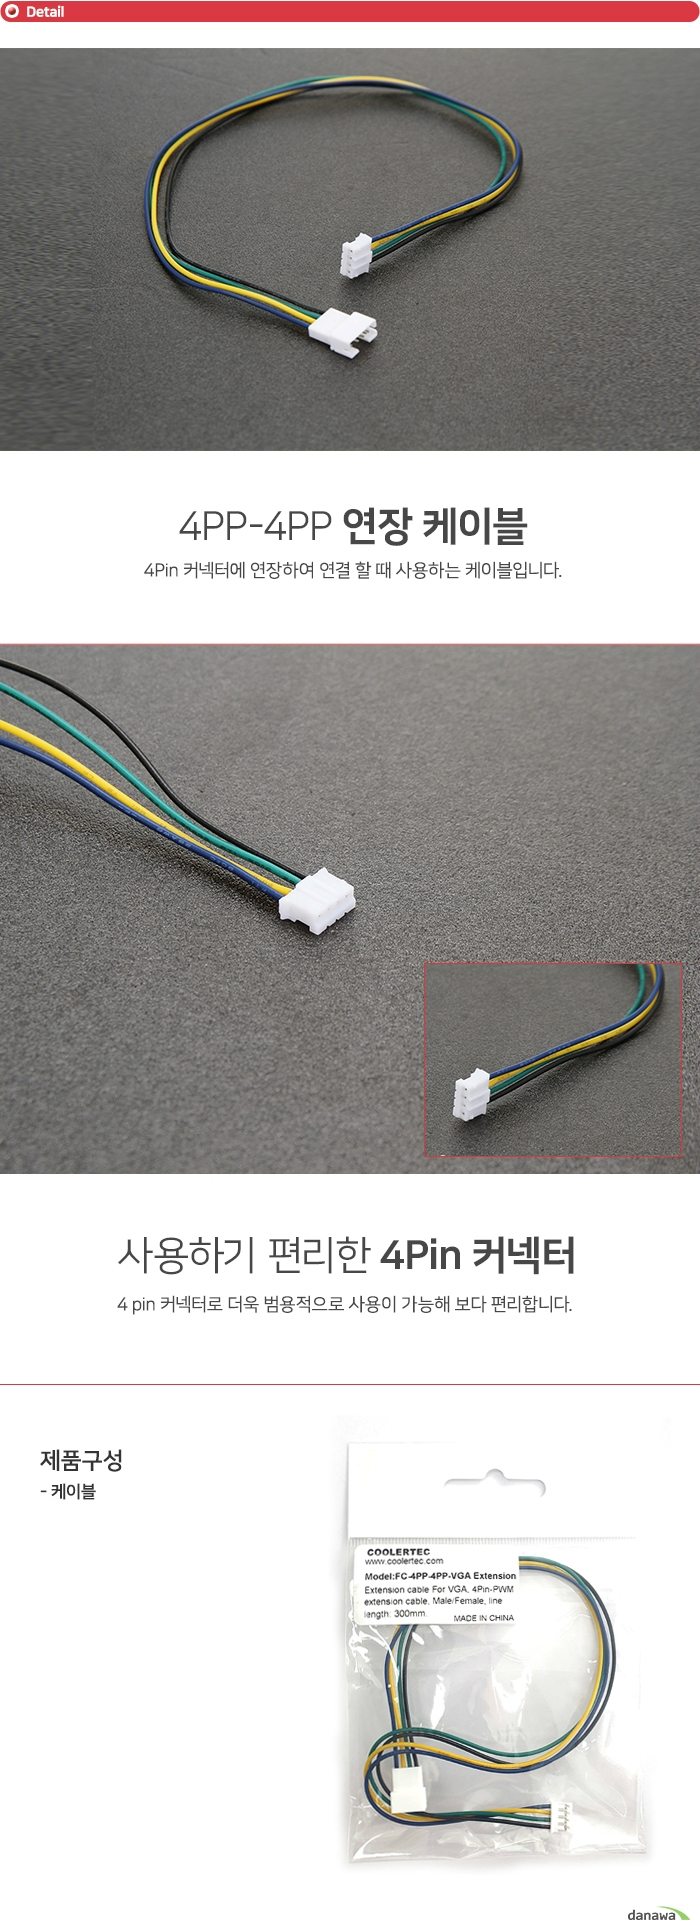 COOLERTEC FC-4PP-4PP-VGA